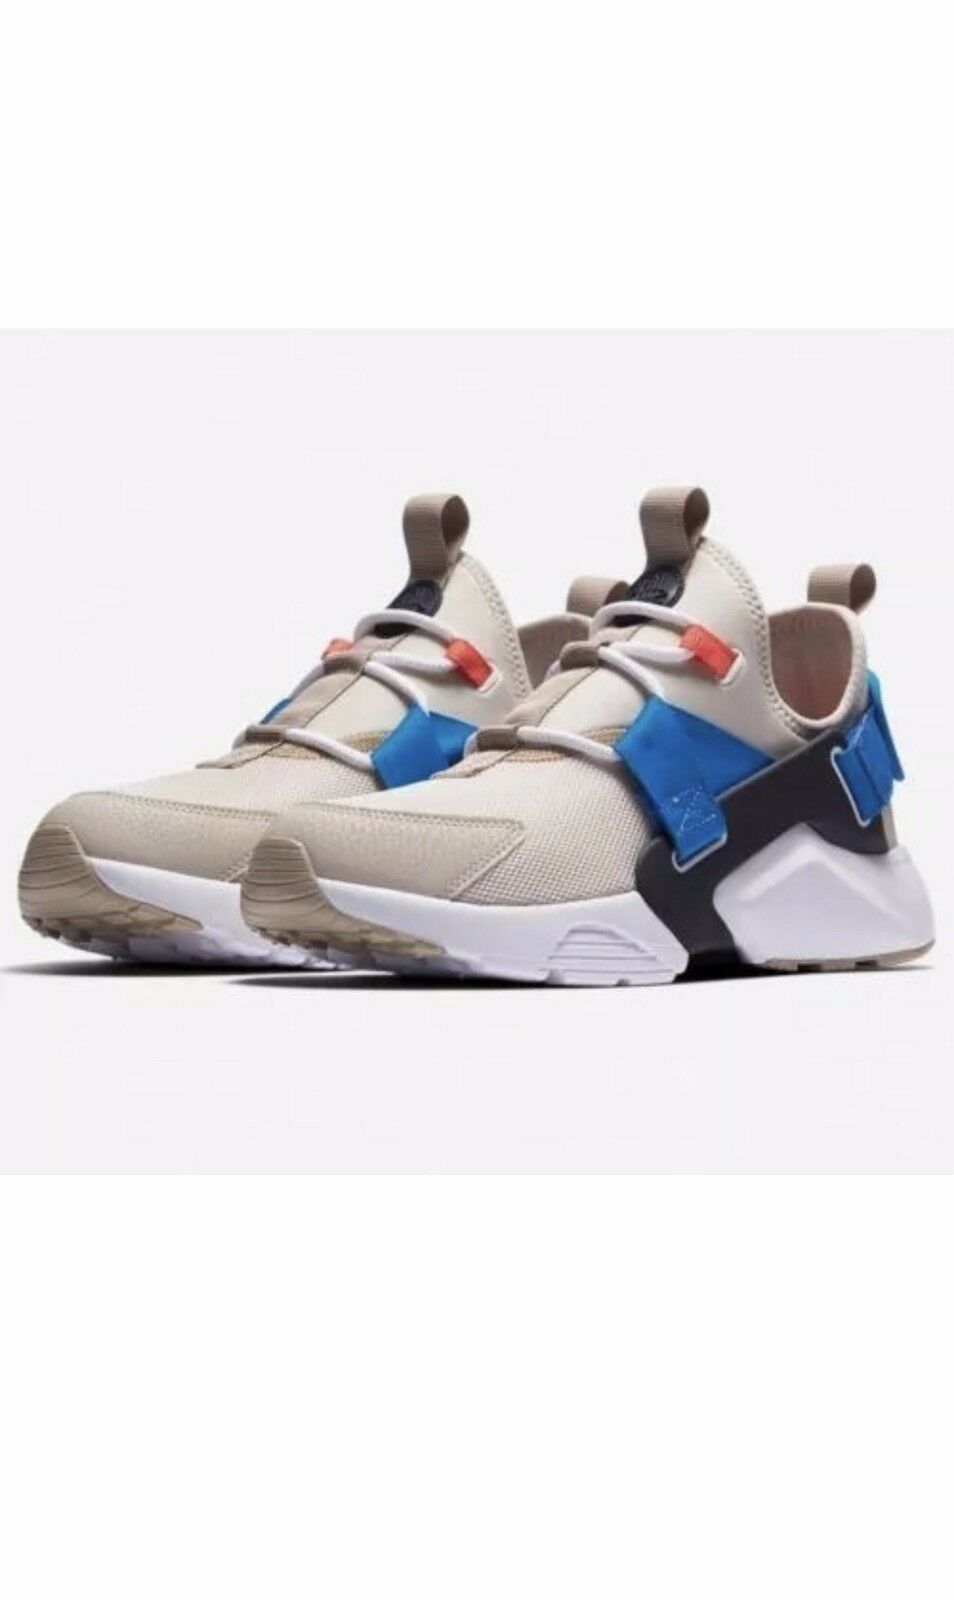 Womens Nike Air Huarache City Low AH6804-006 Desert Sand  New Size 10 & 11.5